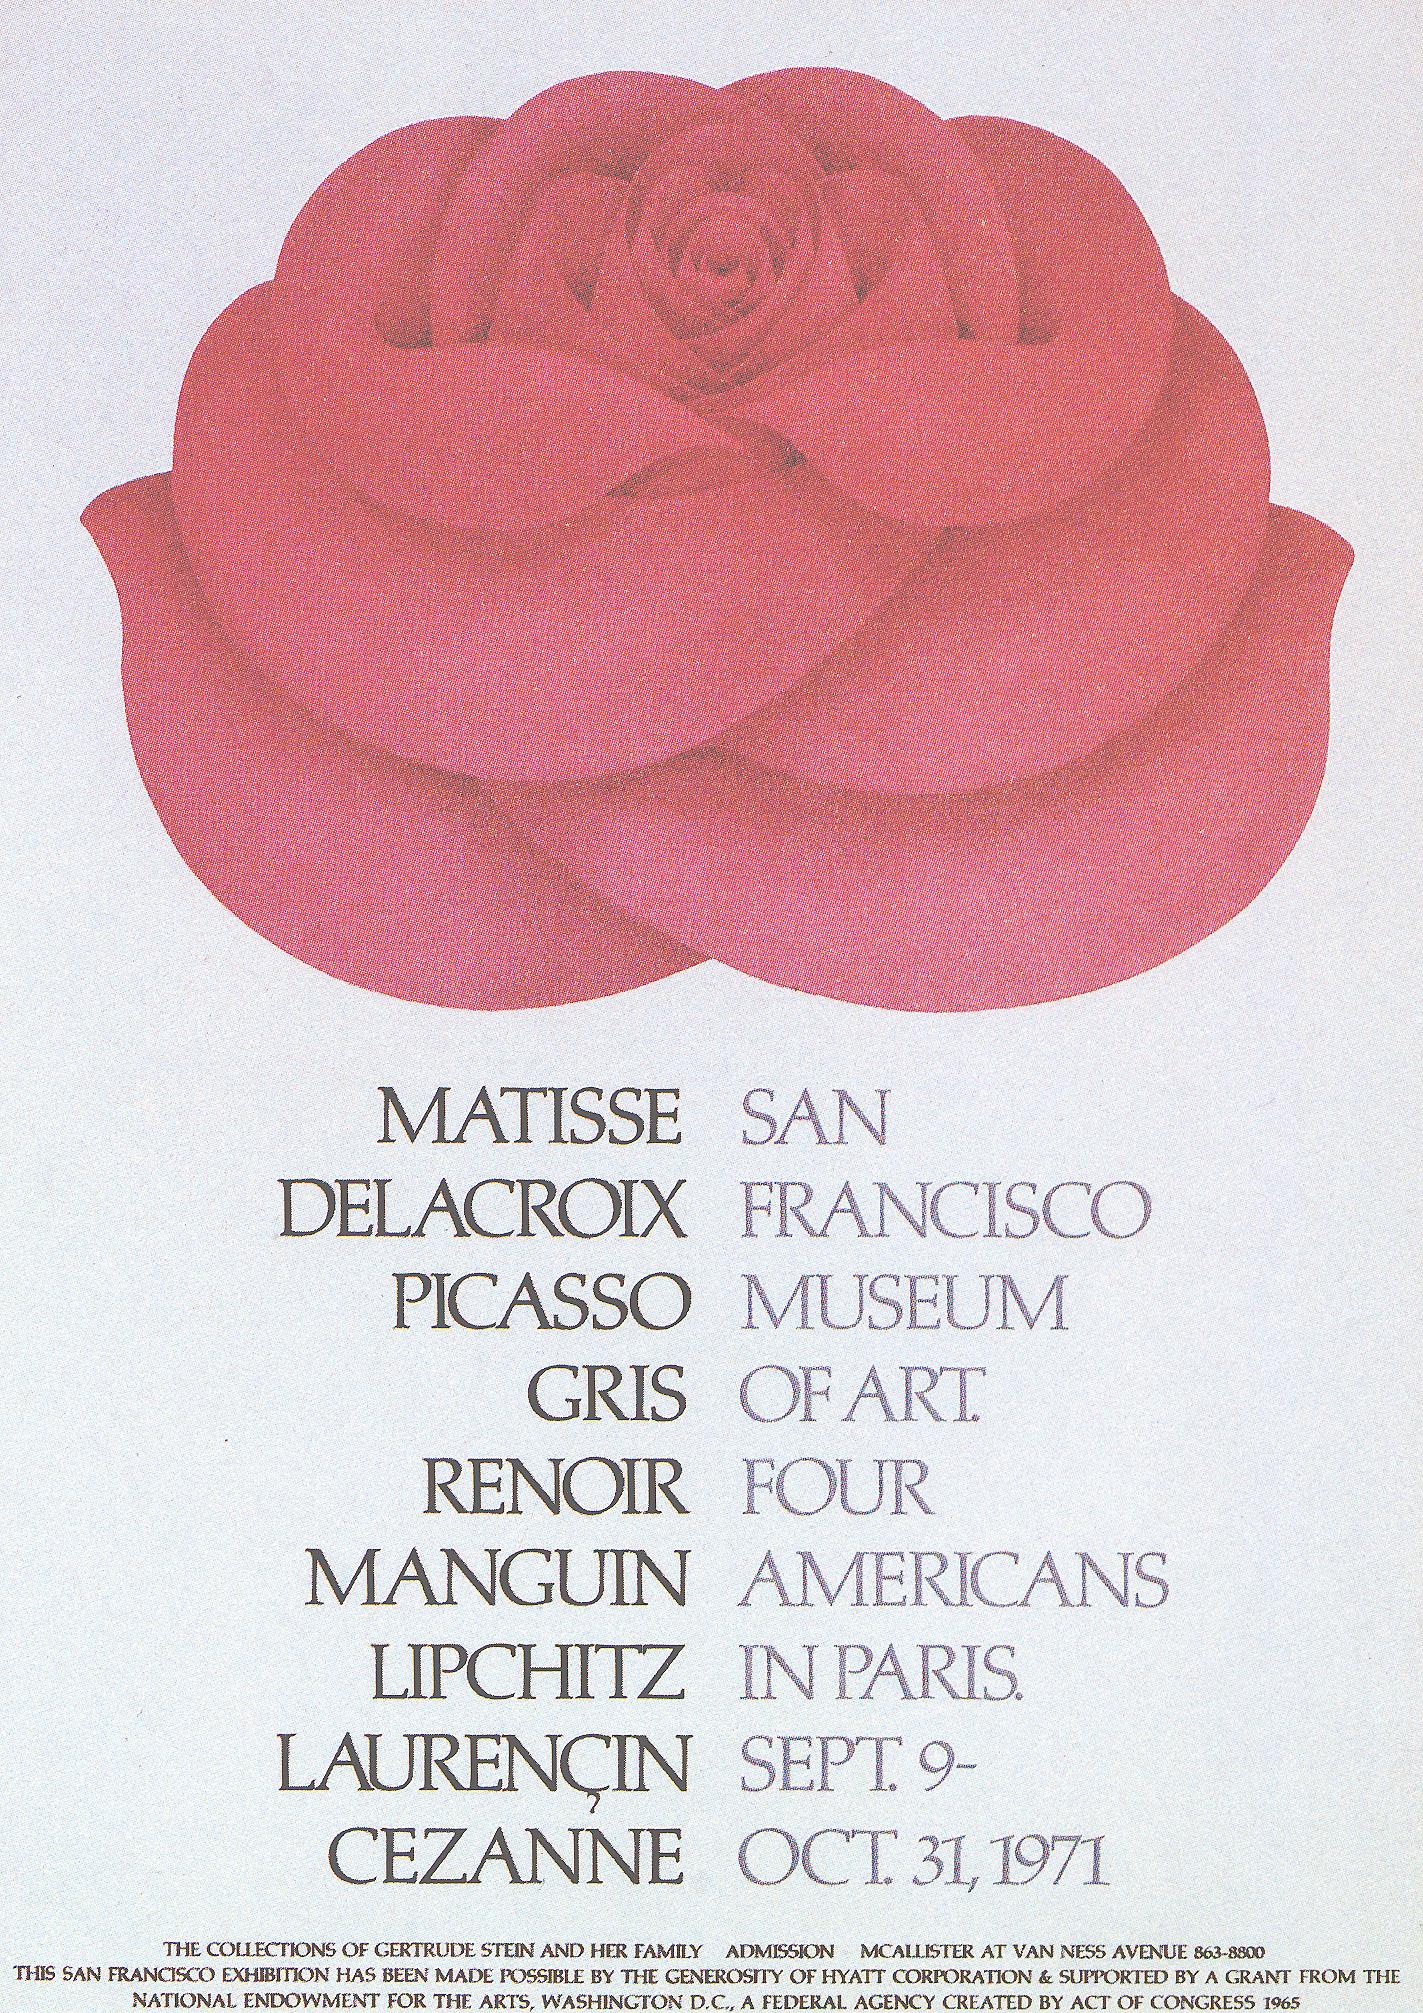 San Francisco Museum of Modern Art Gertrude Stein Family Collection.  Reis & Manwaring 1971